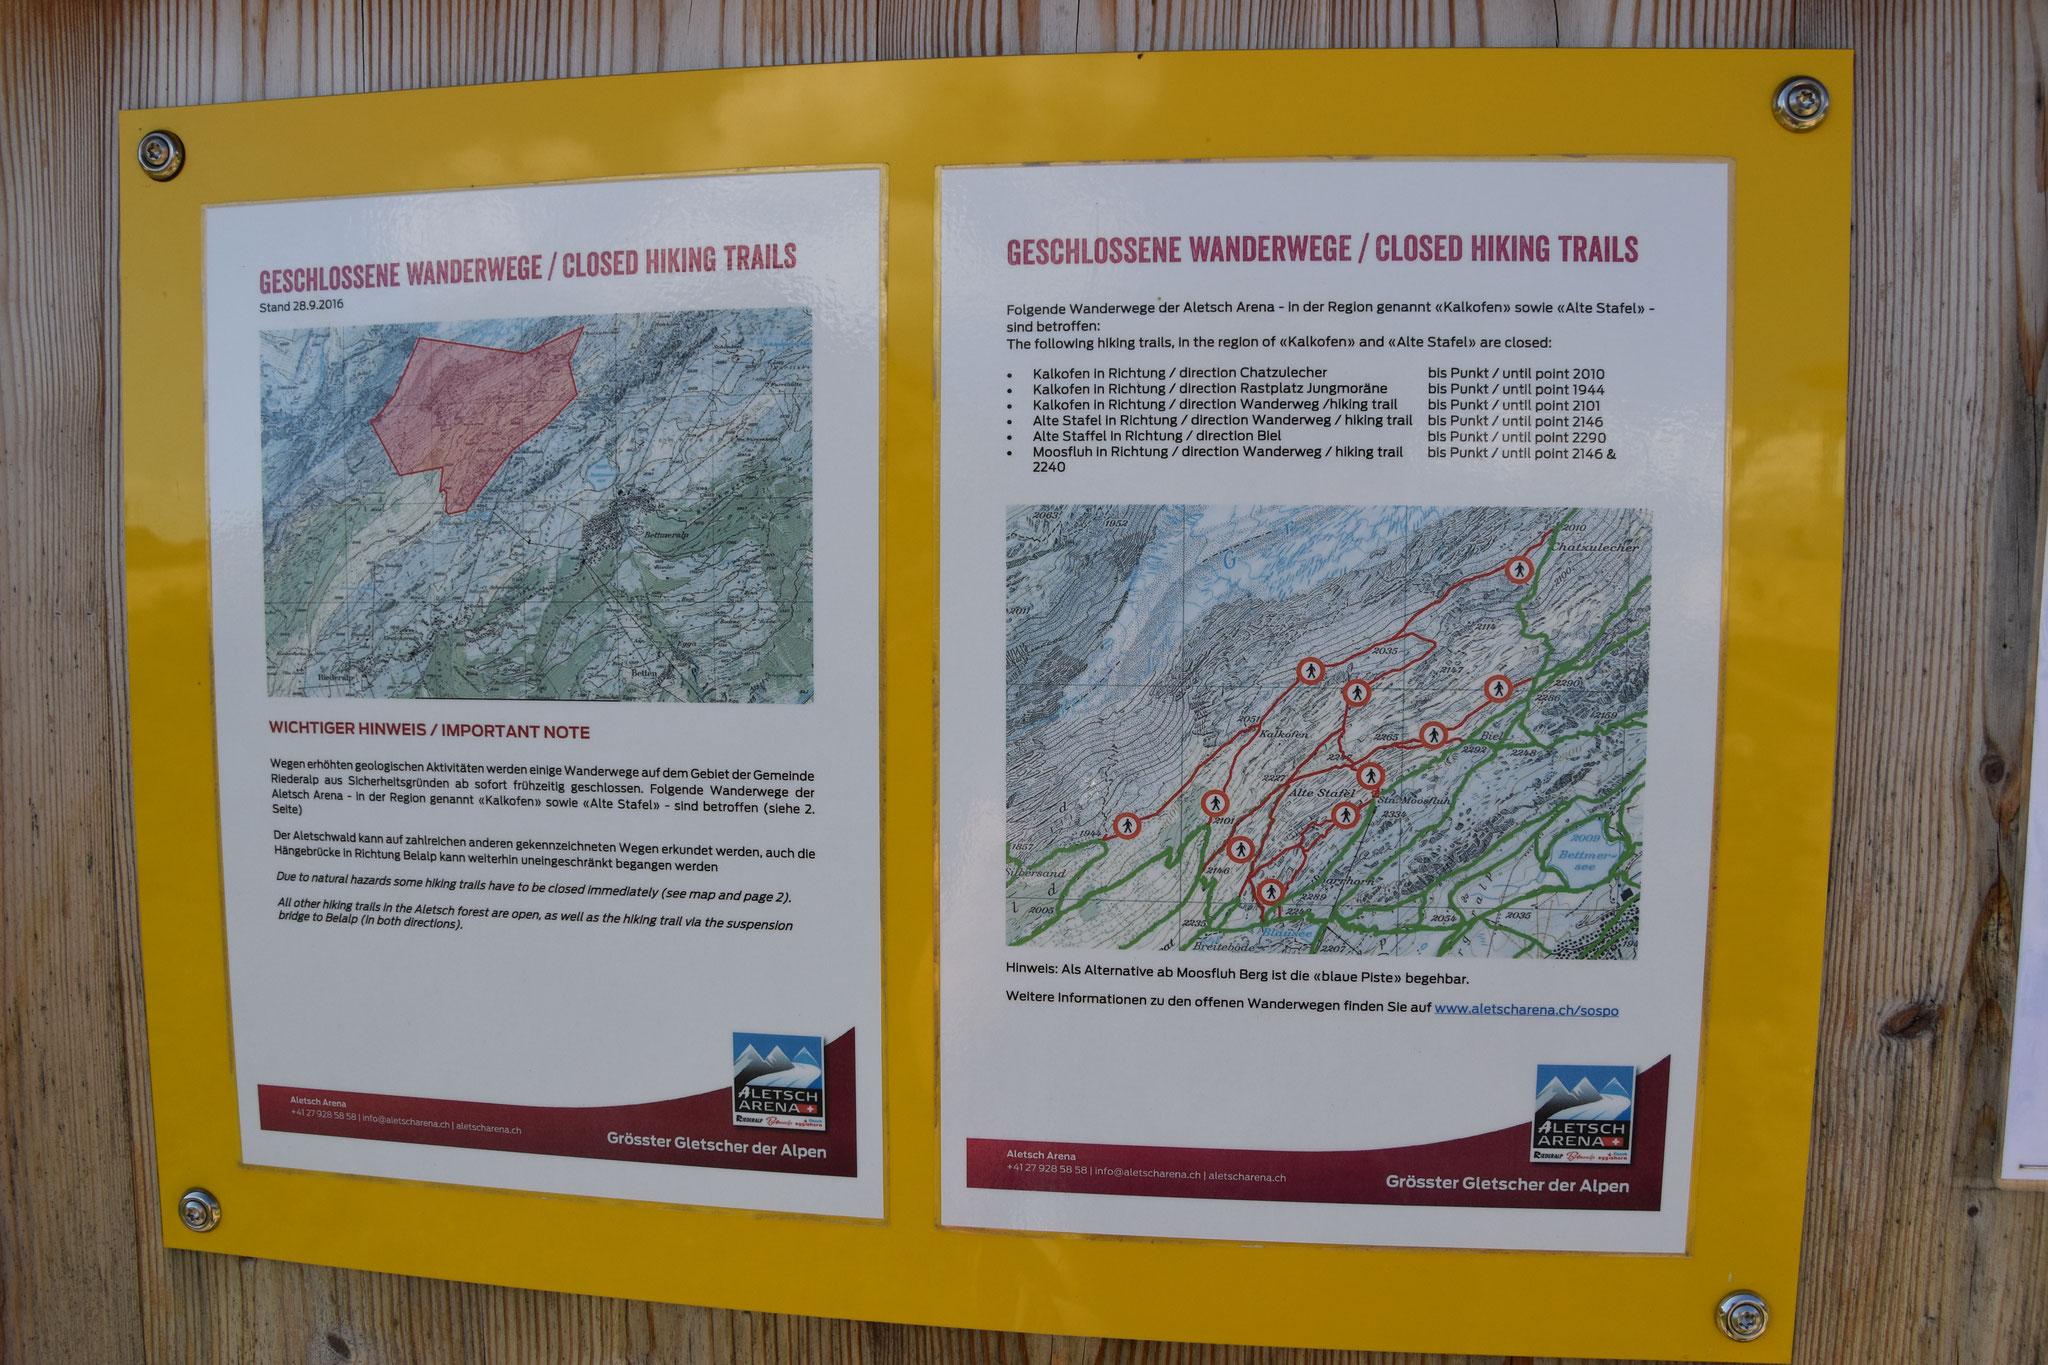 Geologische Bewegungen im Aletschgebiet